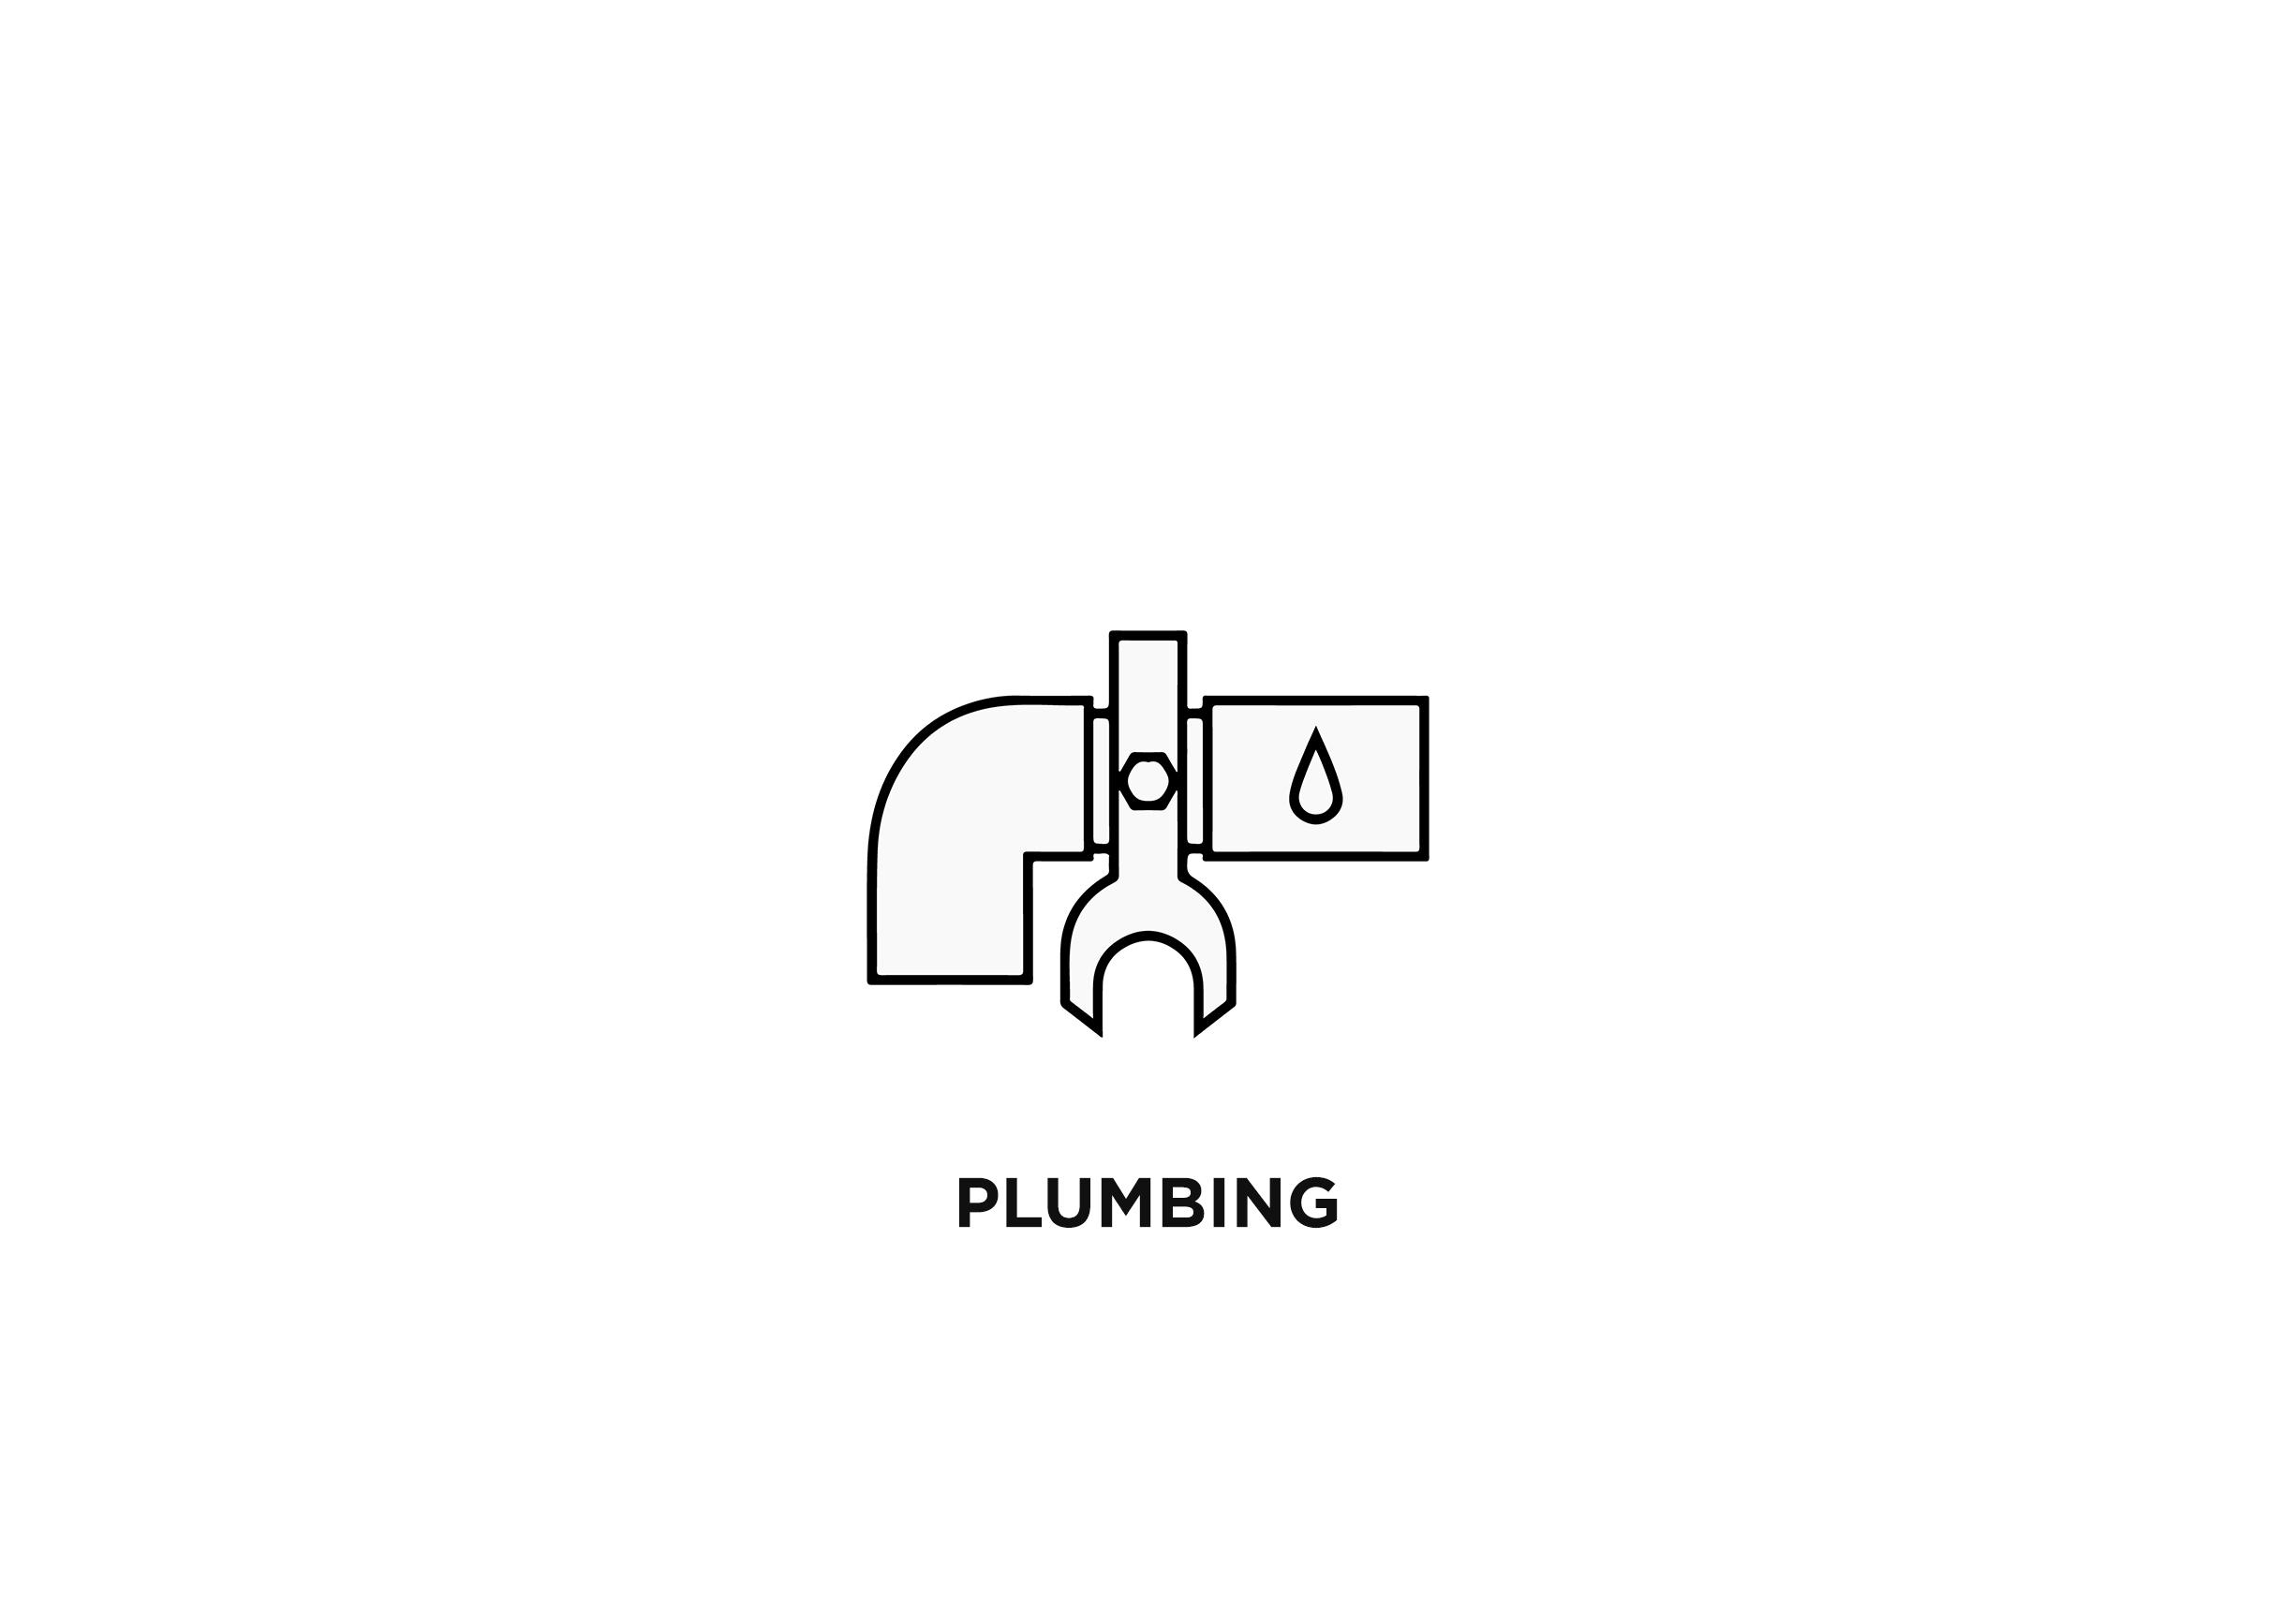 plumbingforweb.jpg